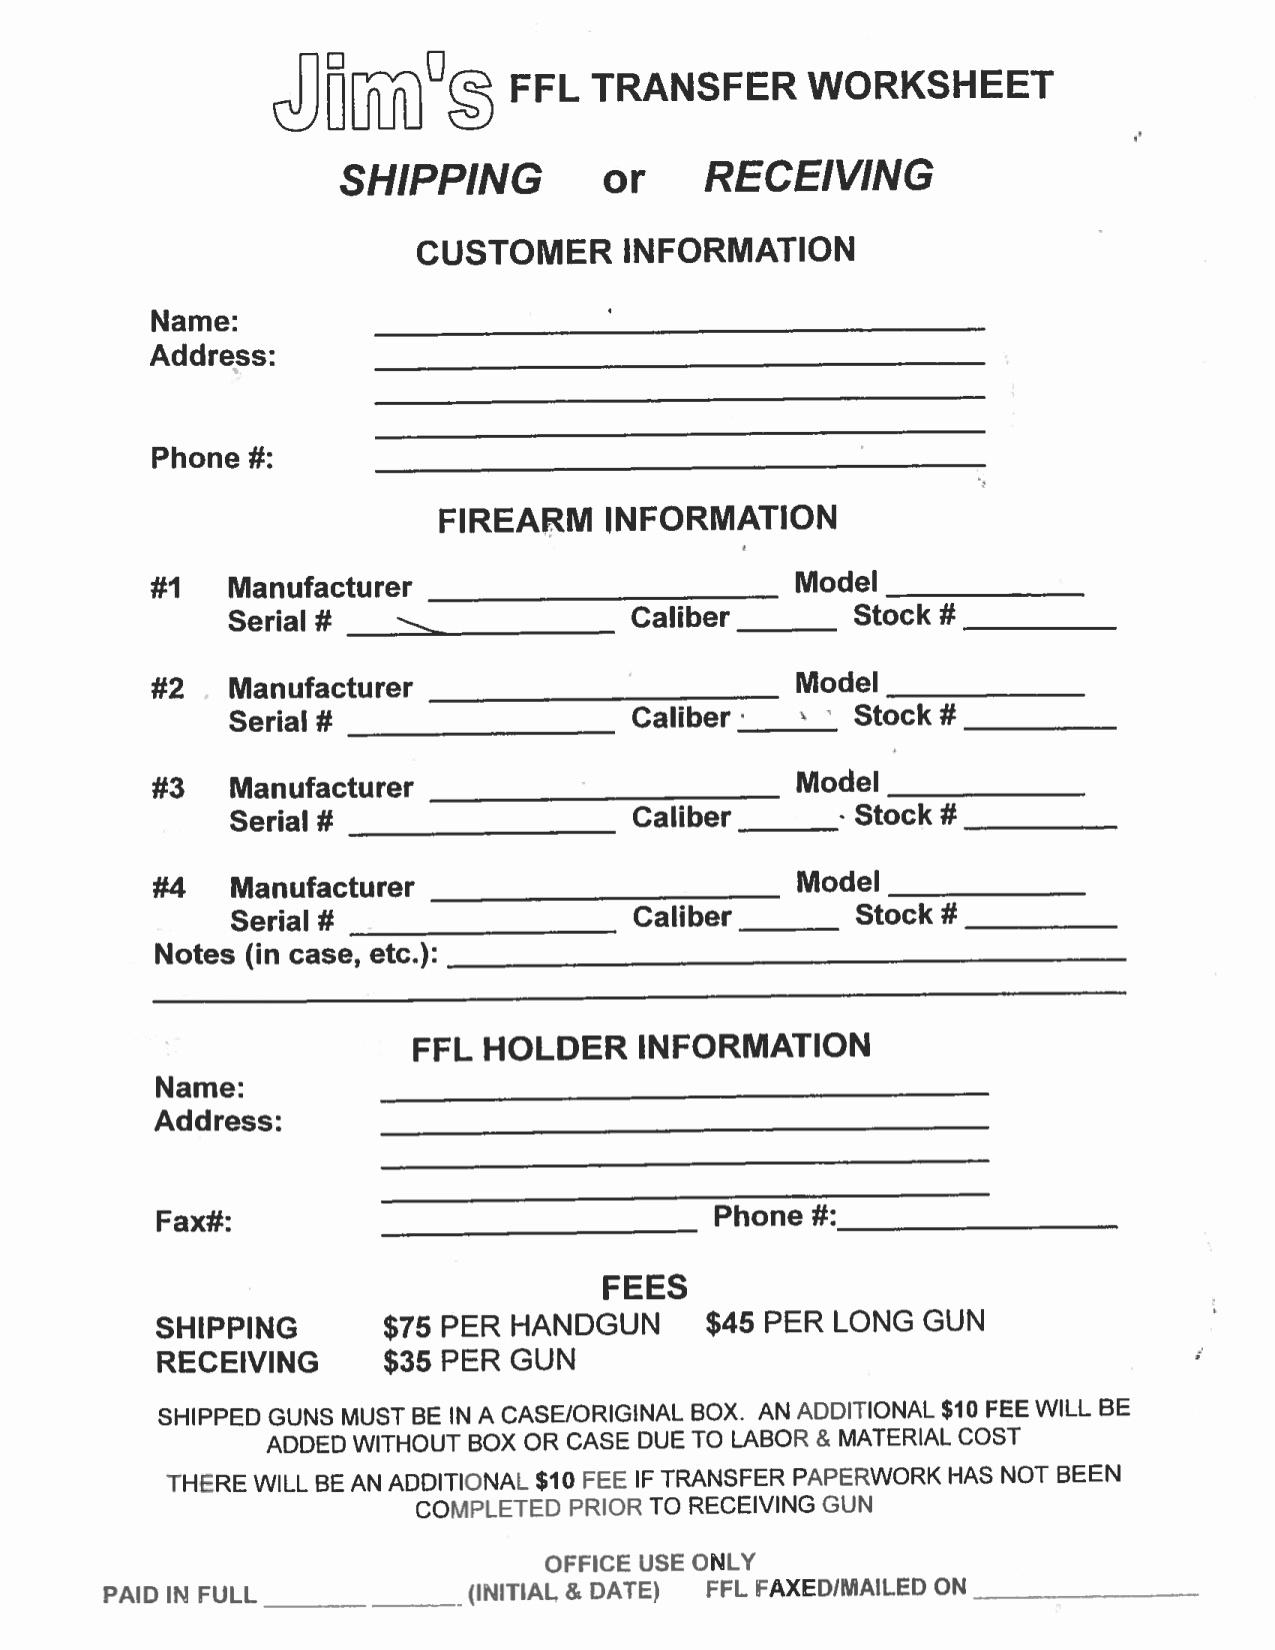 Free Printable Layaway Forms Free - Tduck.ca - Free Printable Layaway Forms